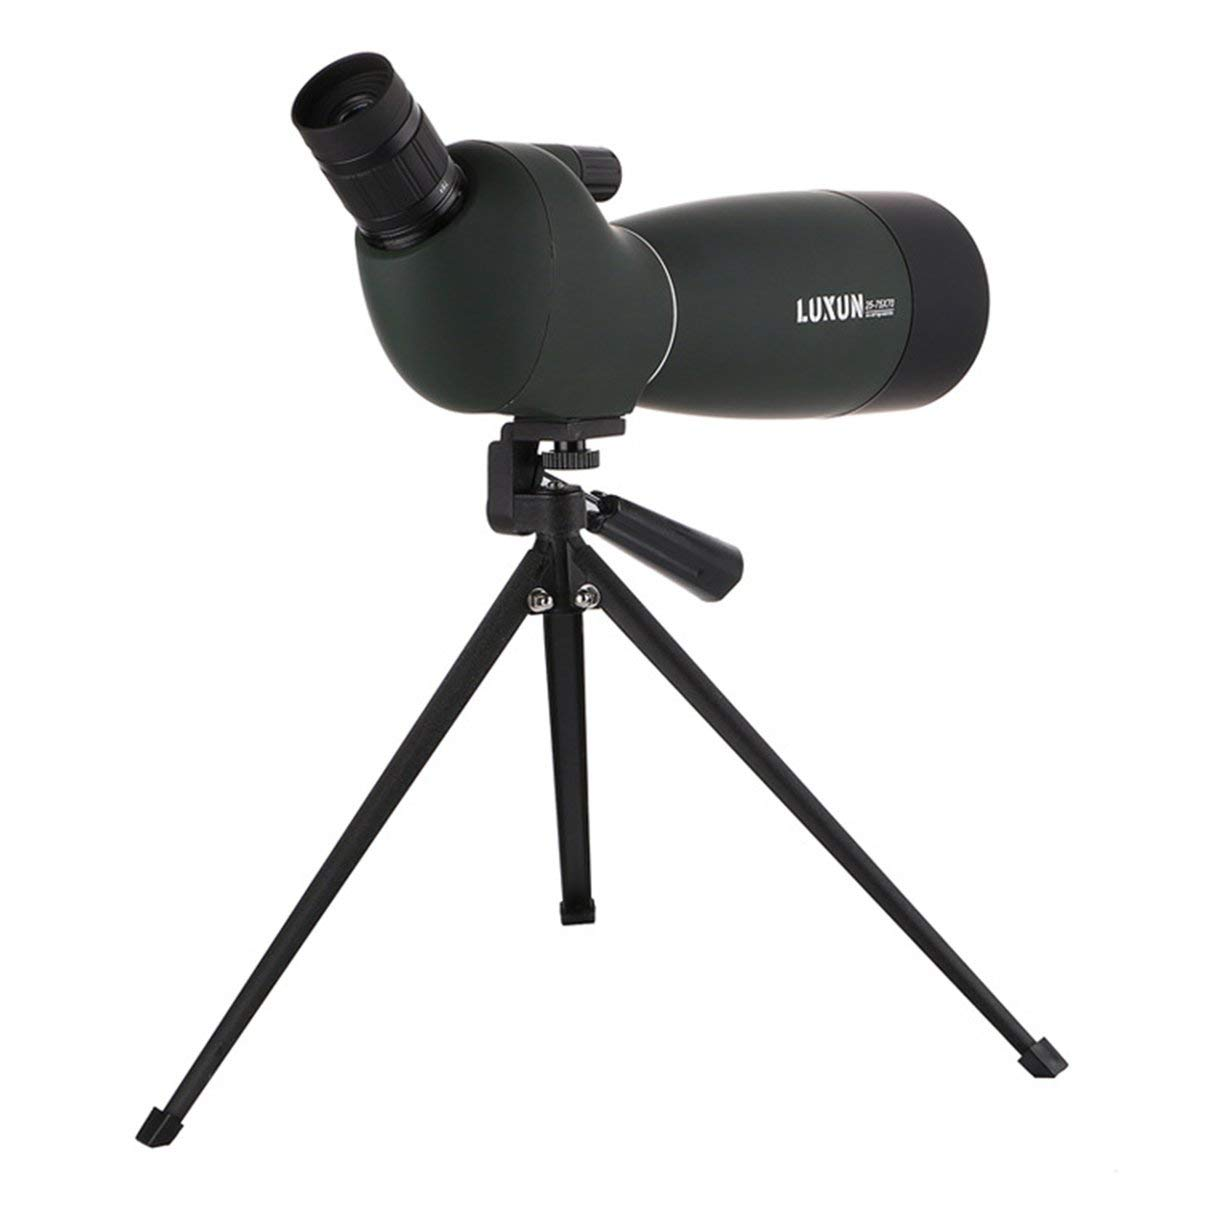 Telescopio monocular de Alta claridad Observación de de de Gran Apertura a Prueba de Agua Telescopio de película Verde HD Observación al Aire Libre Zoom Alcance 213d9e